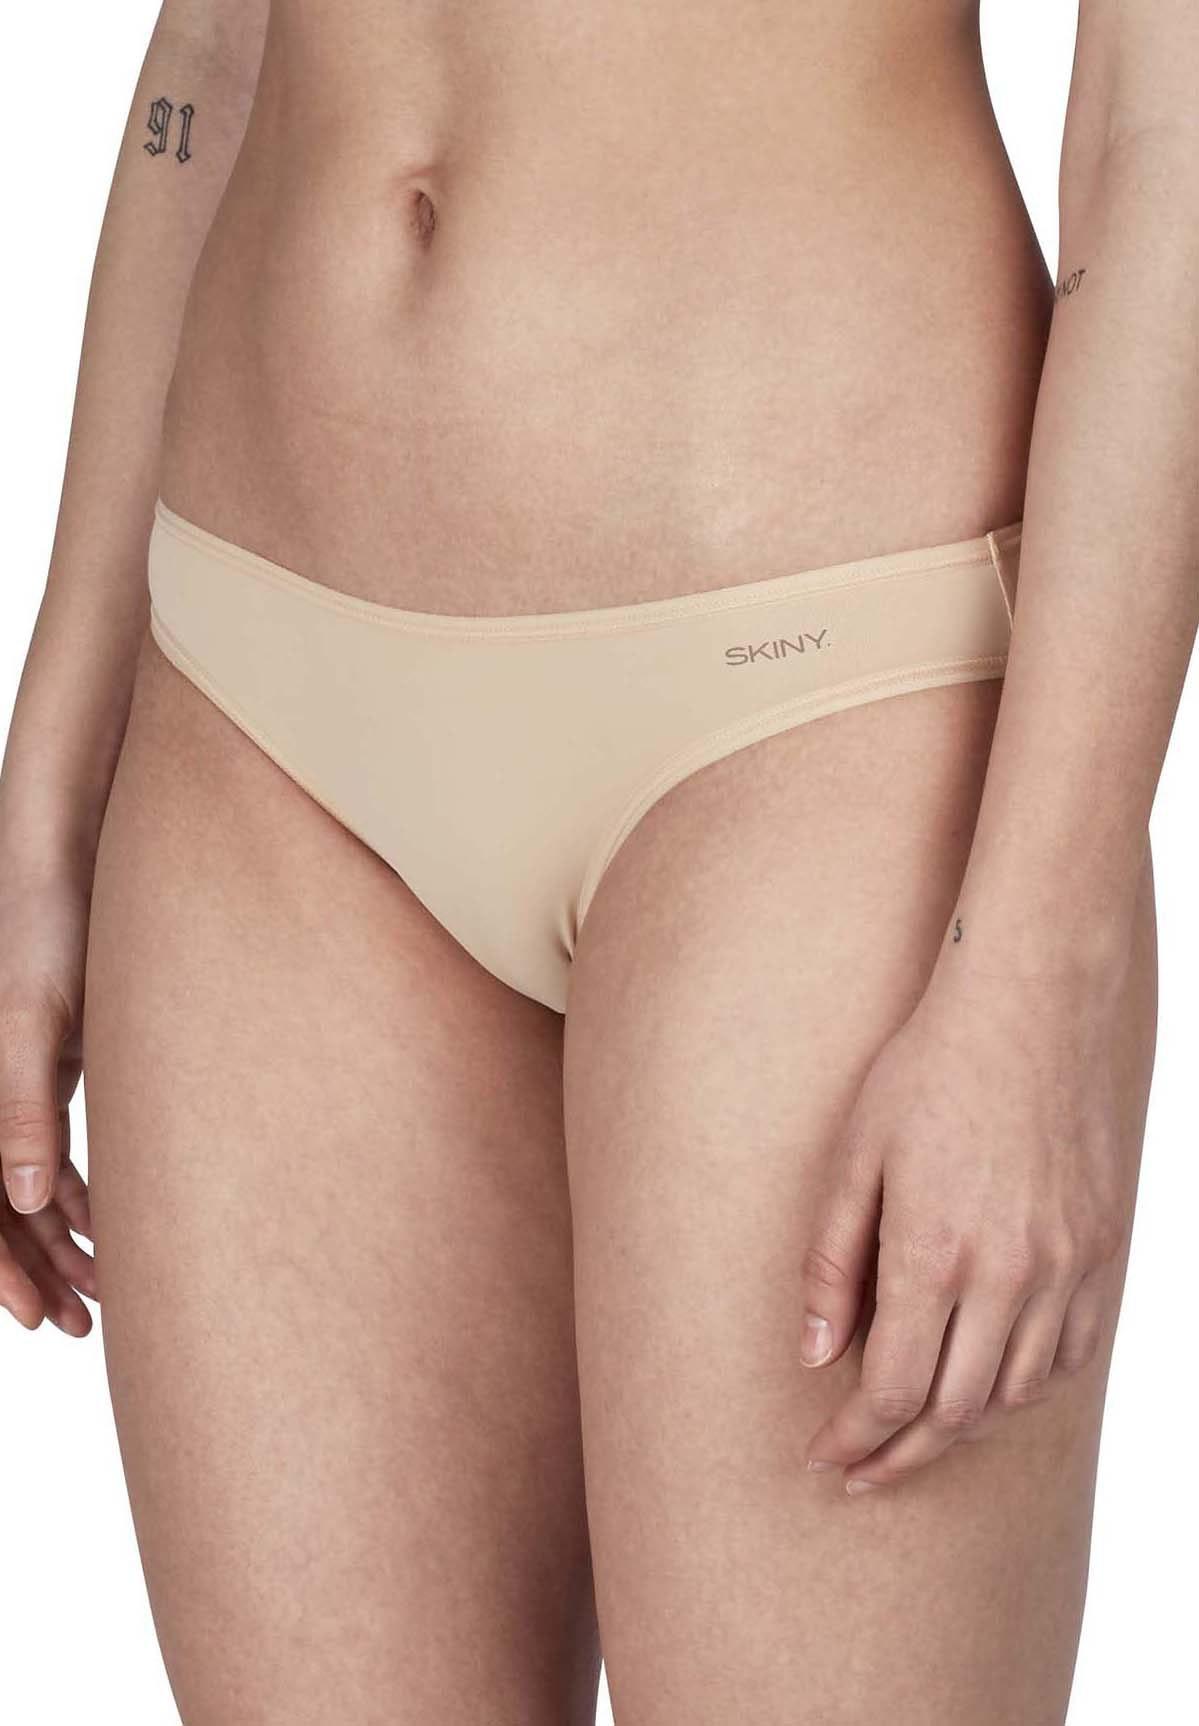 Skiny 4 Stück, Advantage Micro Damen Rio Slip, Bikini Brief – Bild 6